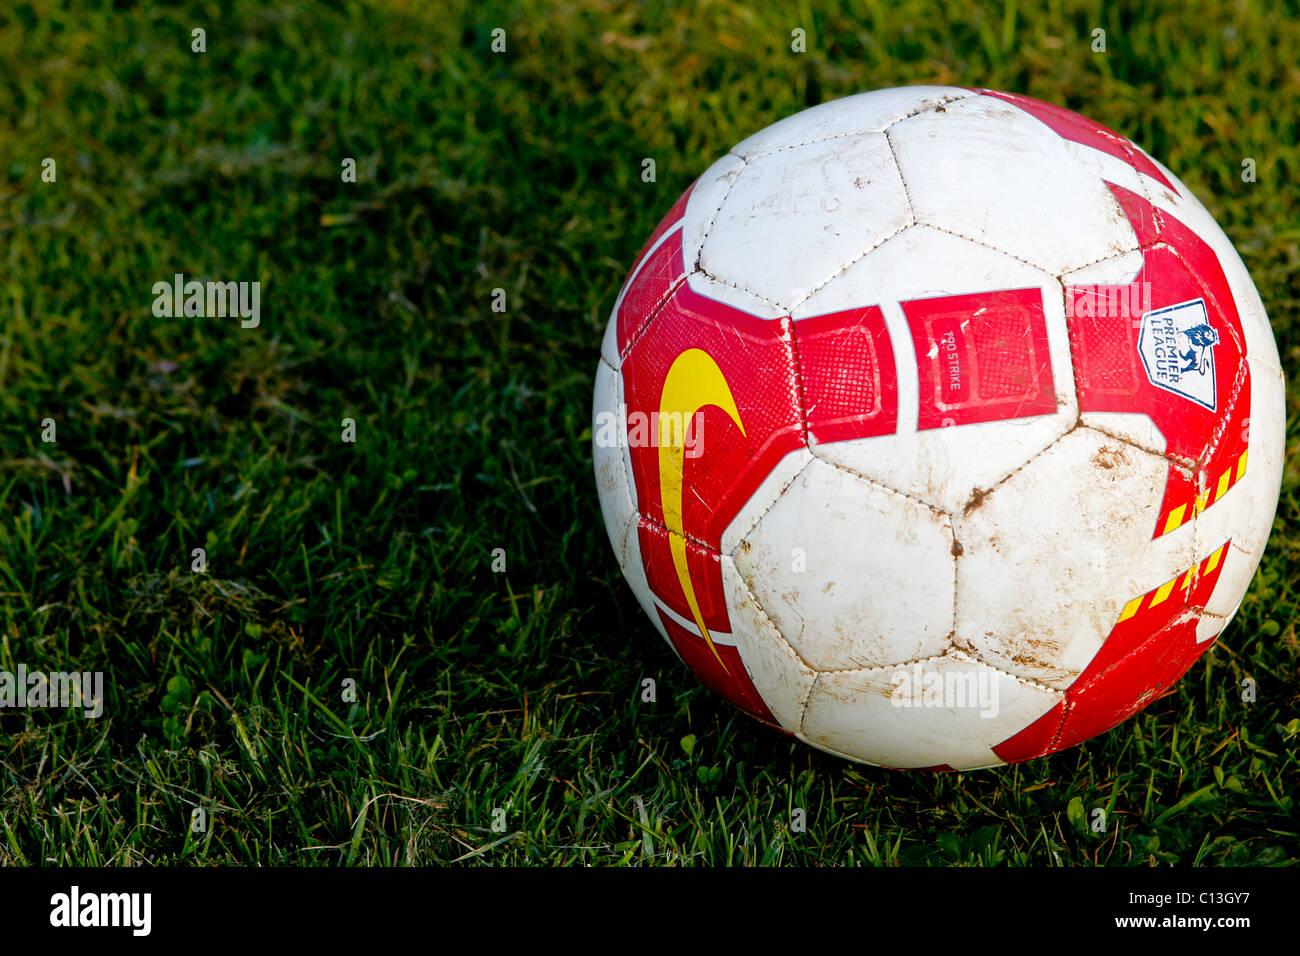 A Nike Barclays Premier League football Stock Photo  35114555 - Alamy f79438db40a8